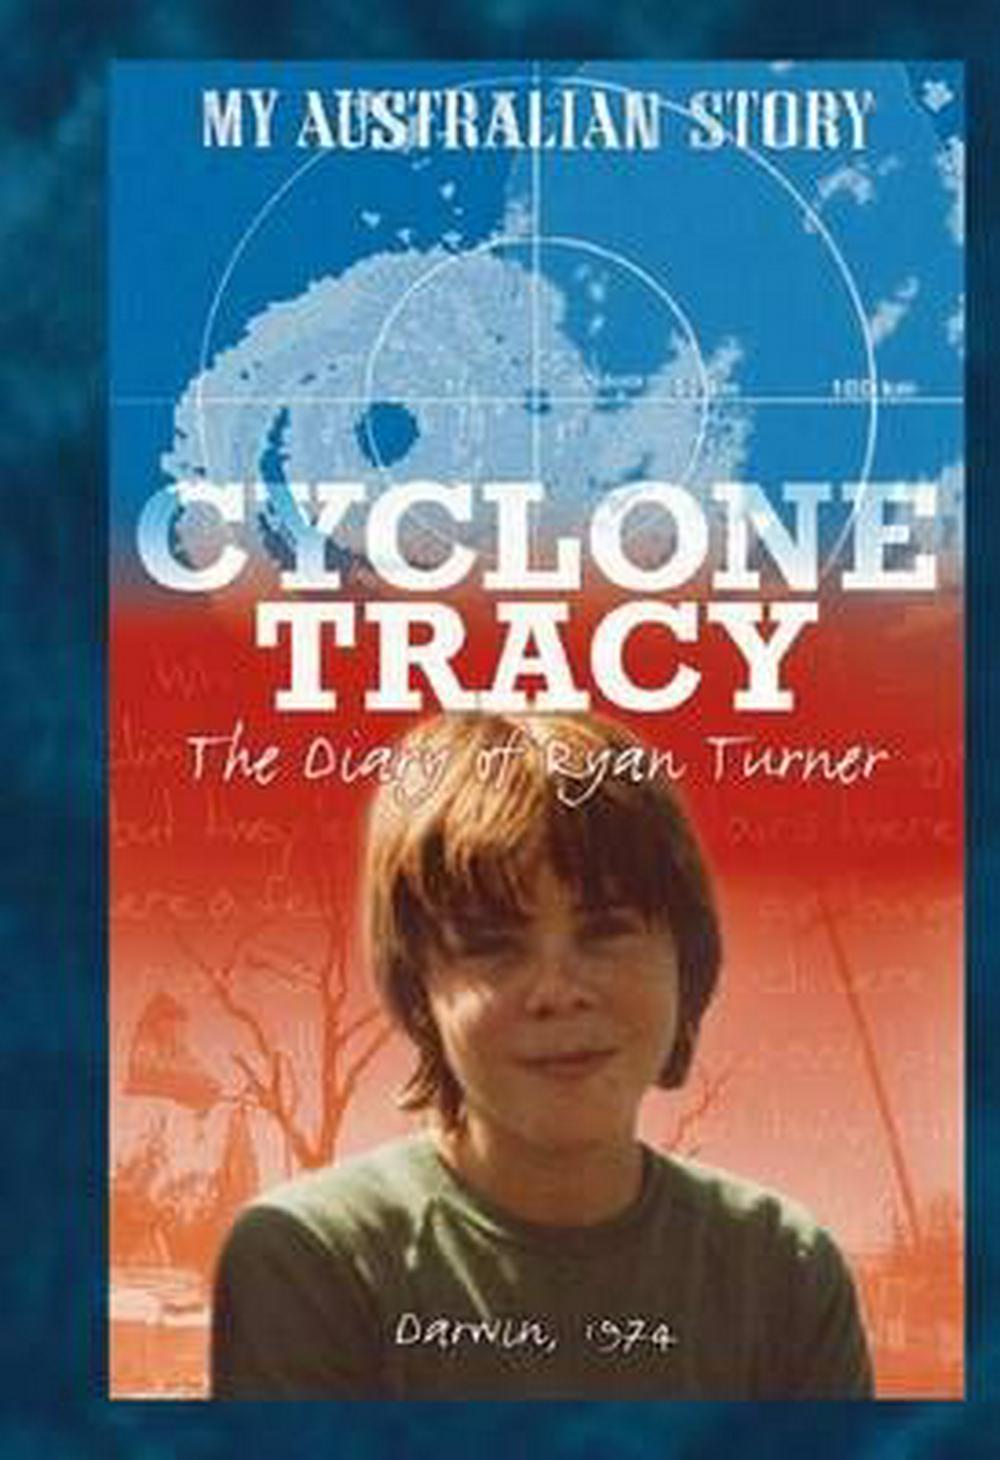 Cyclone-Tracy